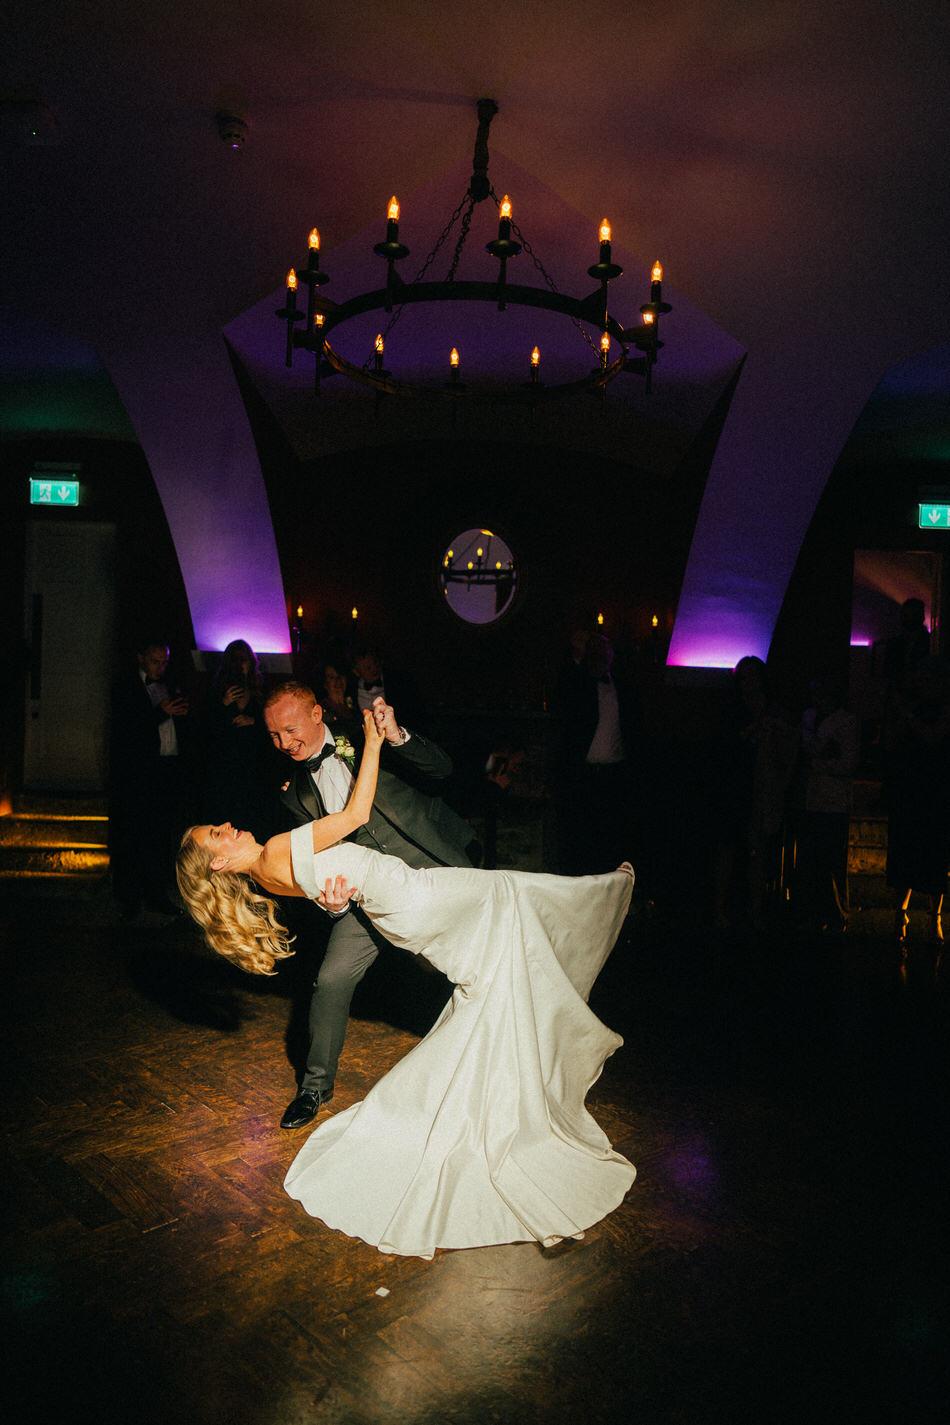 Castle-wedding-ireland-photos- 0328 241